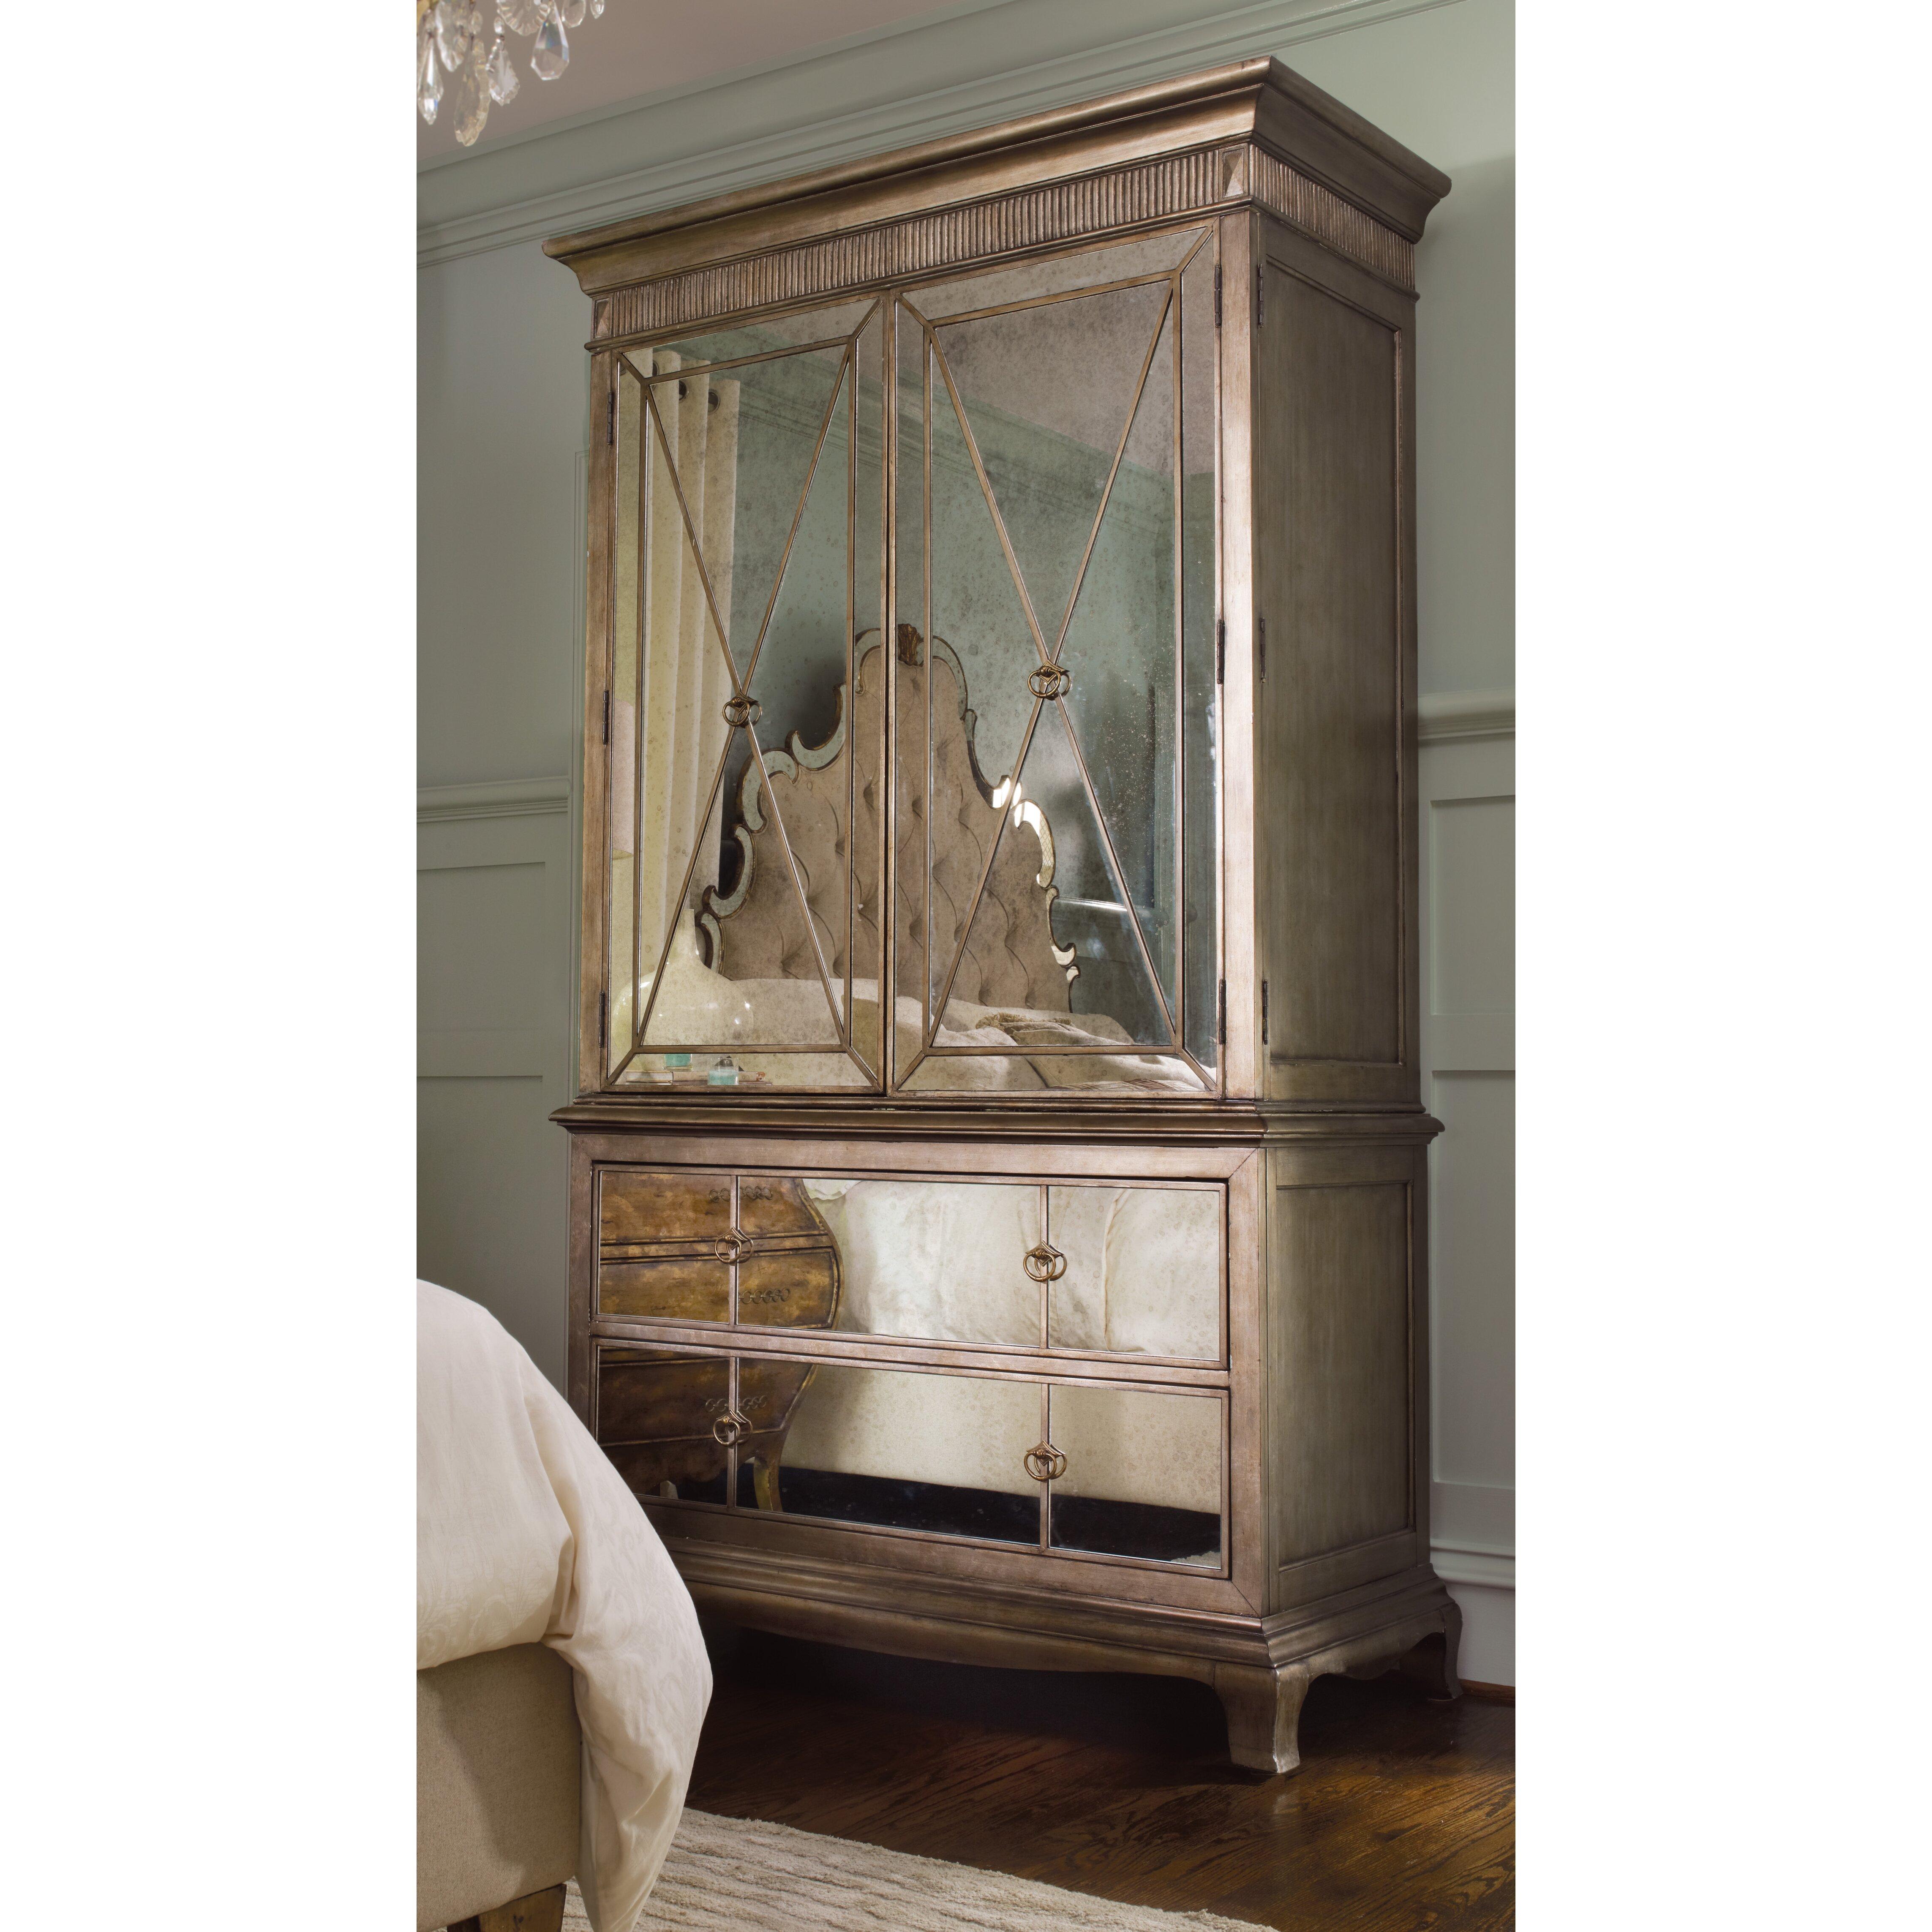 Hooker Furniture Sanctuary Armoire Reviews Wayfair